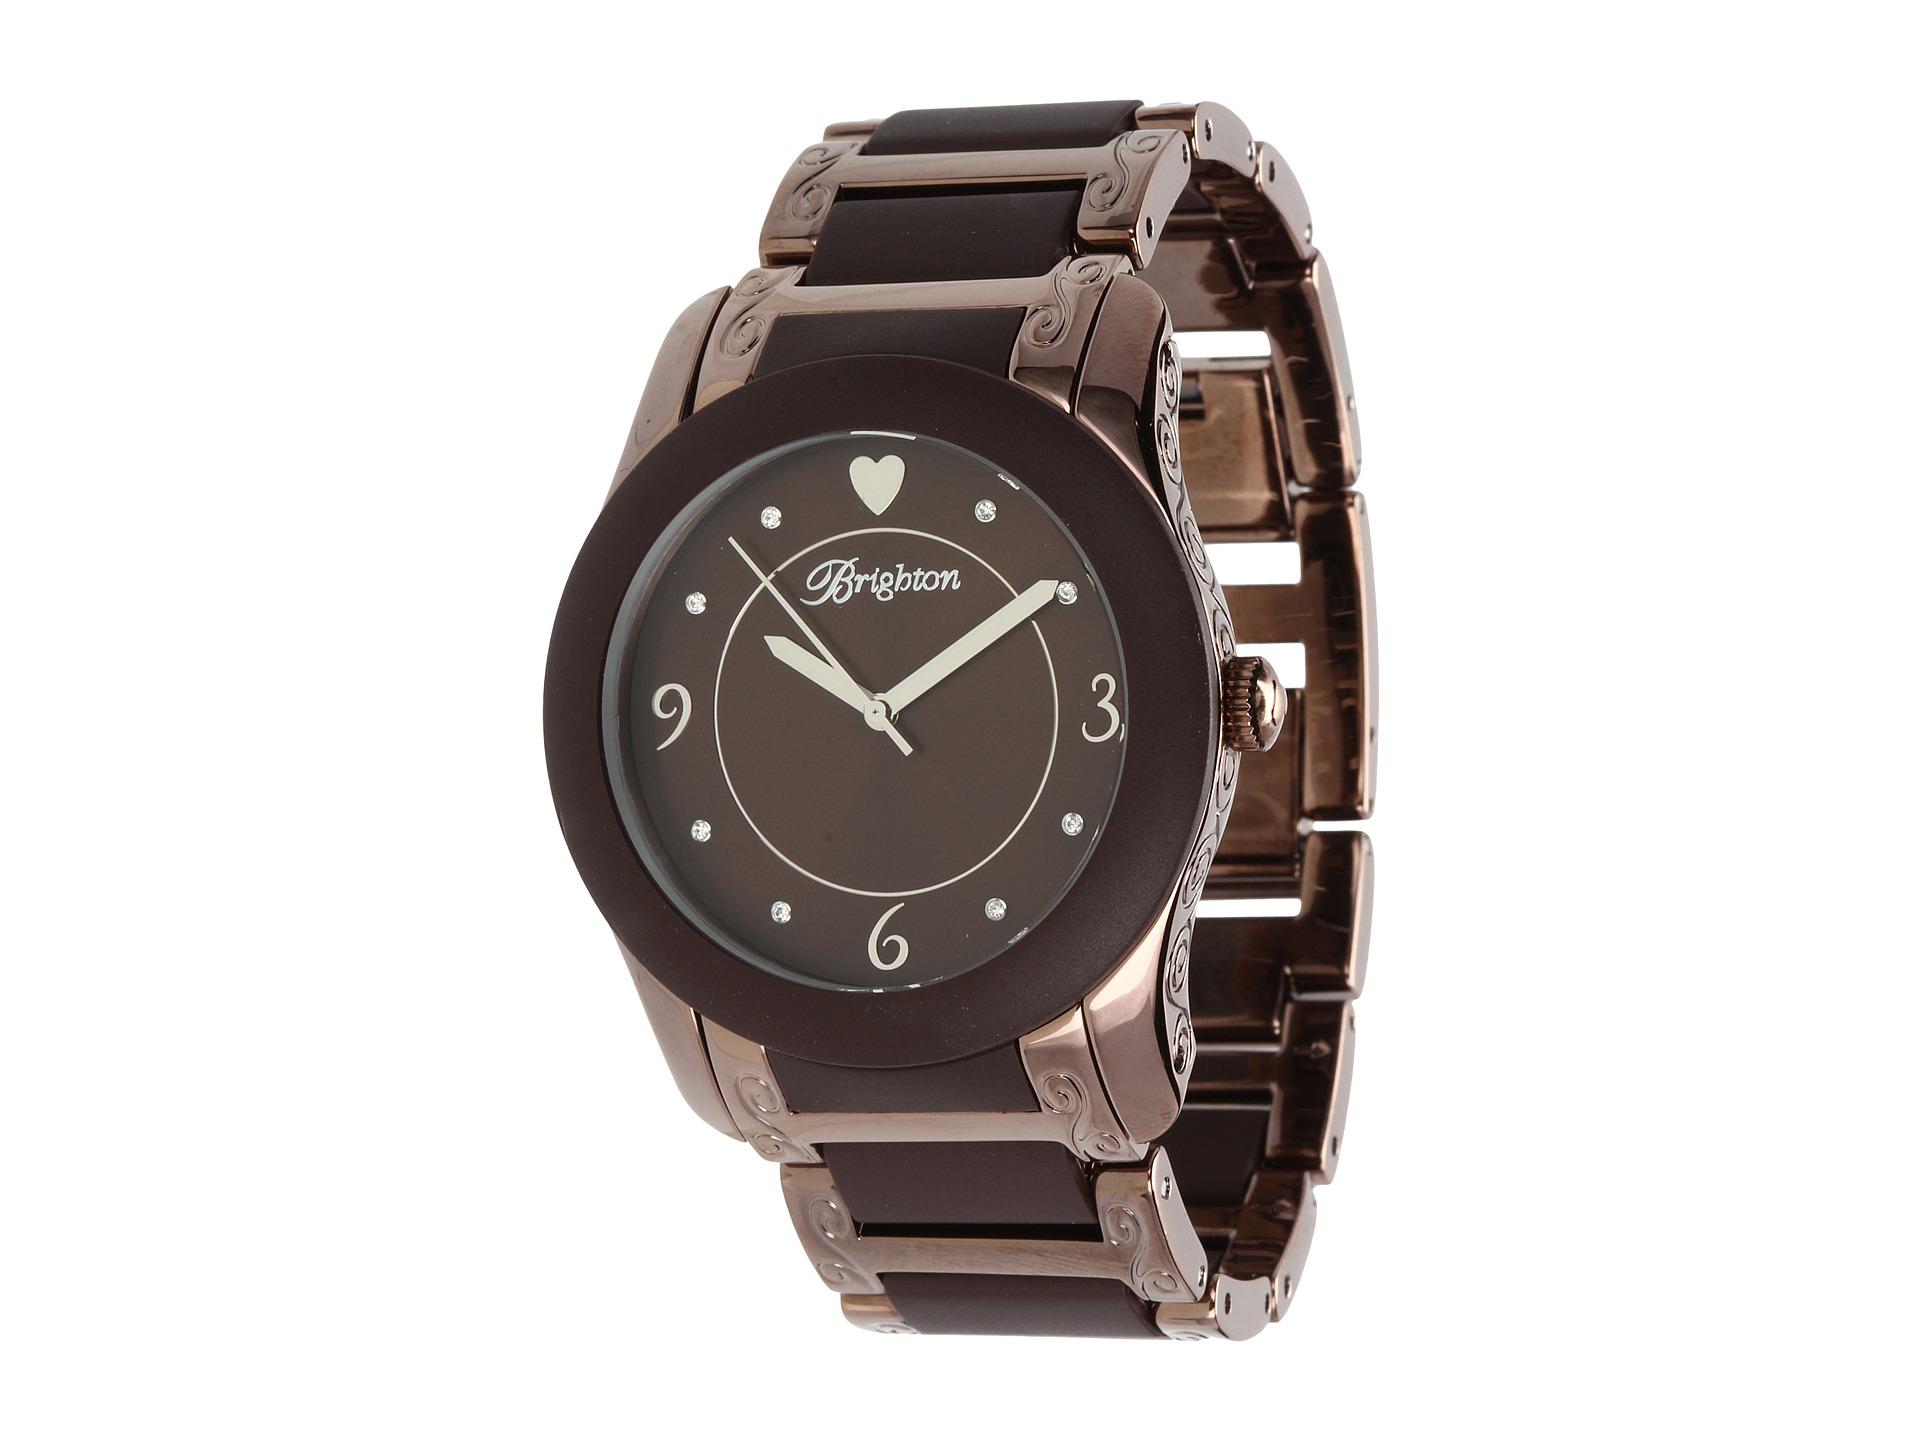 brighton watches shipped free at